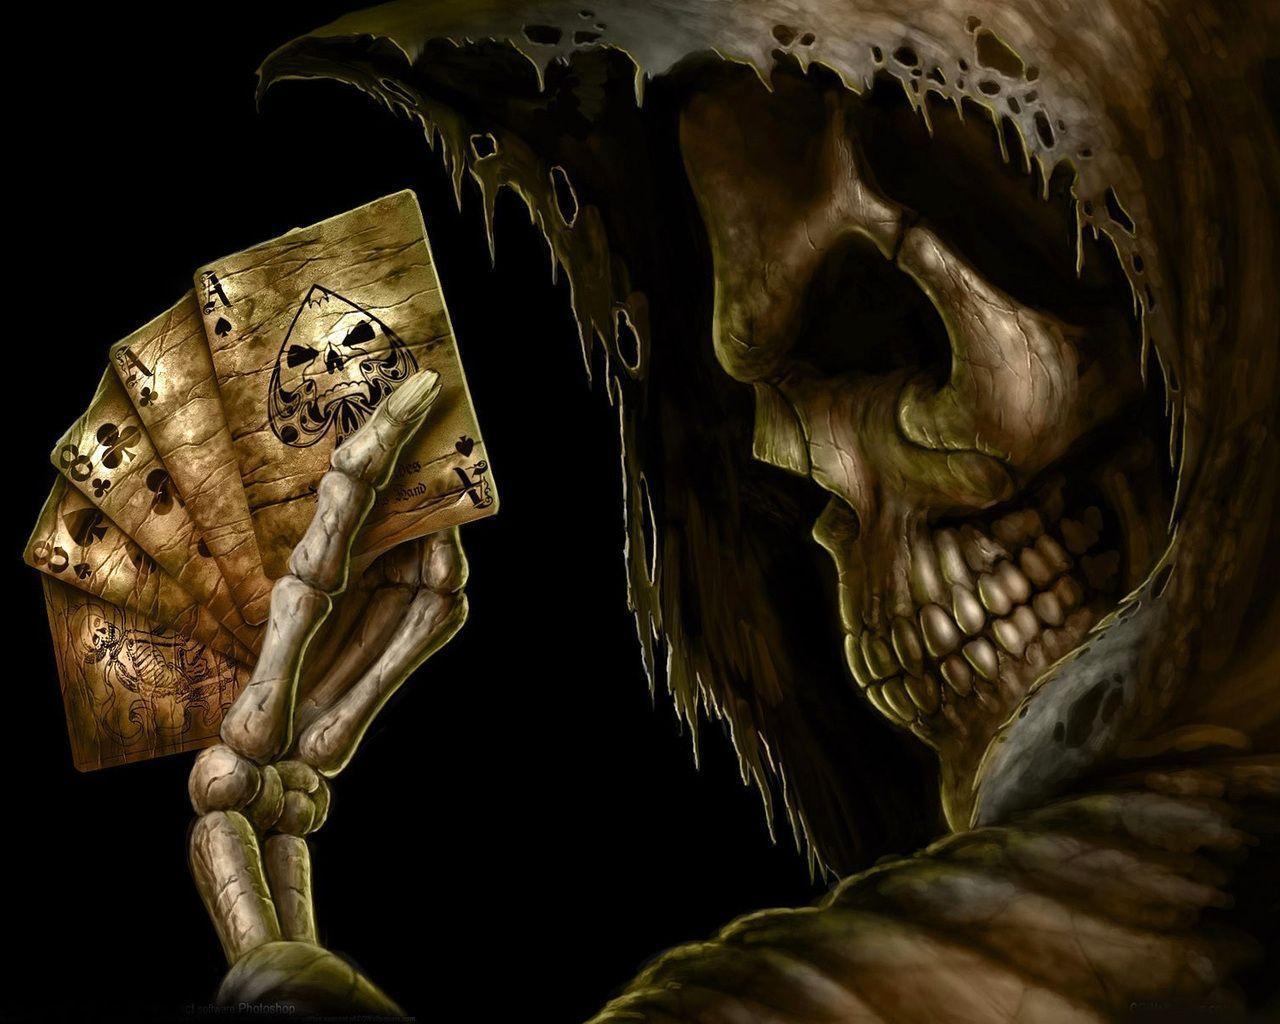 Halloween Skeleton Wallpaper.Funny Skeleton Wallpaper Best Hd Images Of Skeleton Hd